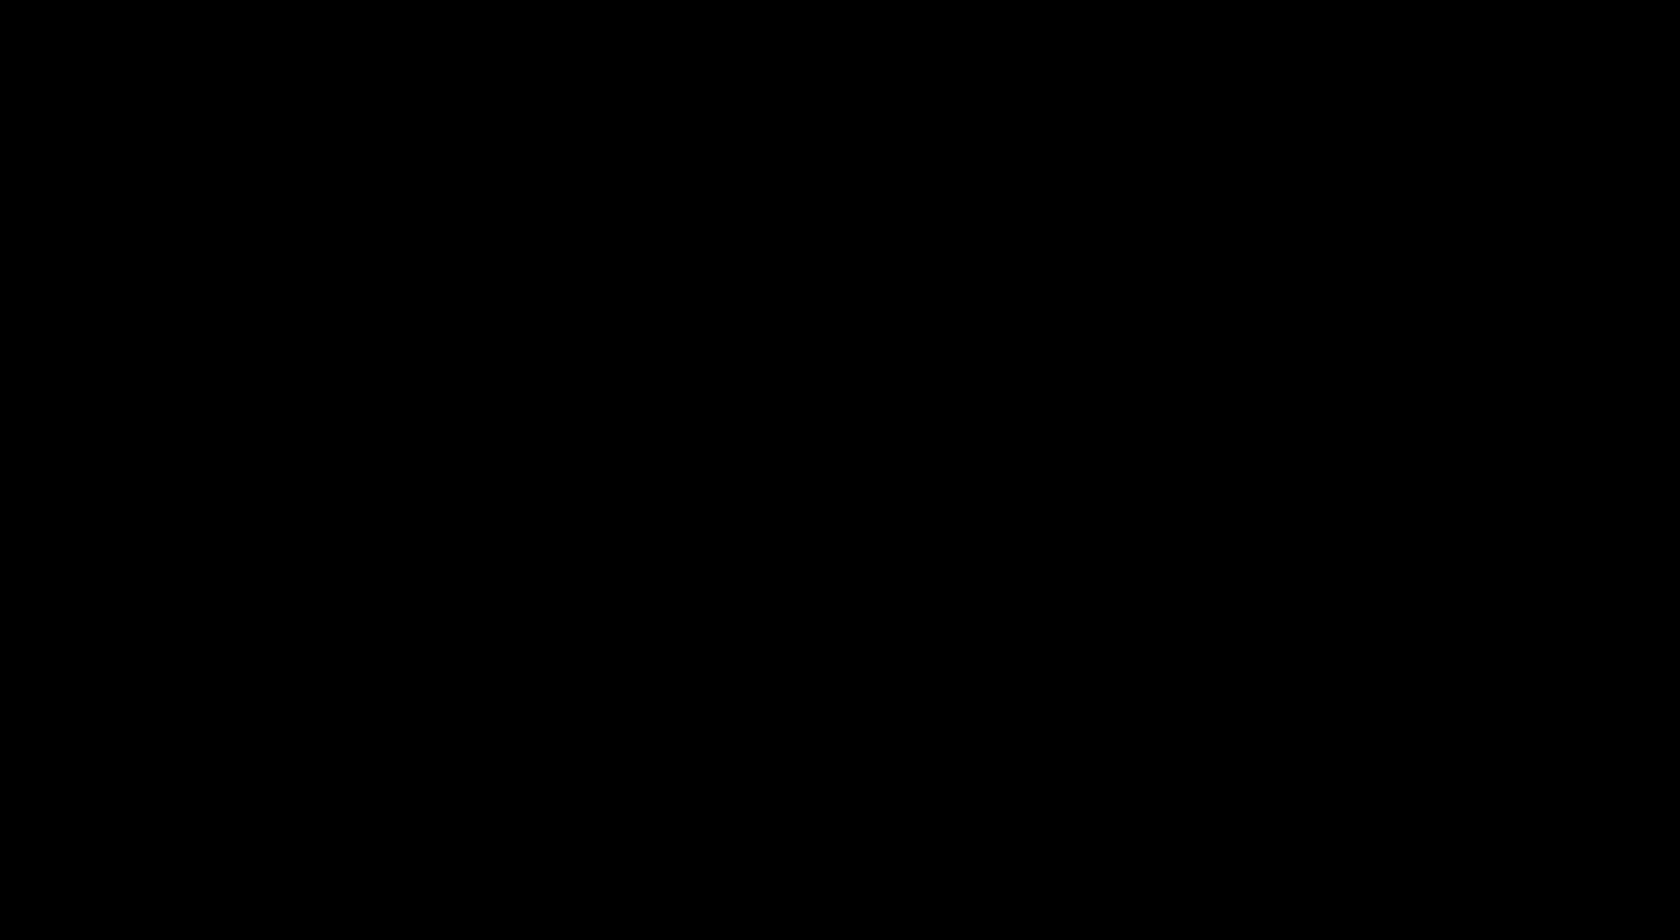 5-Dansyl-N-hydroxypentanamide